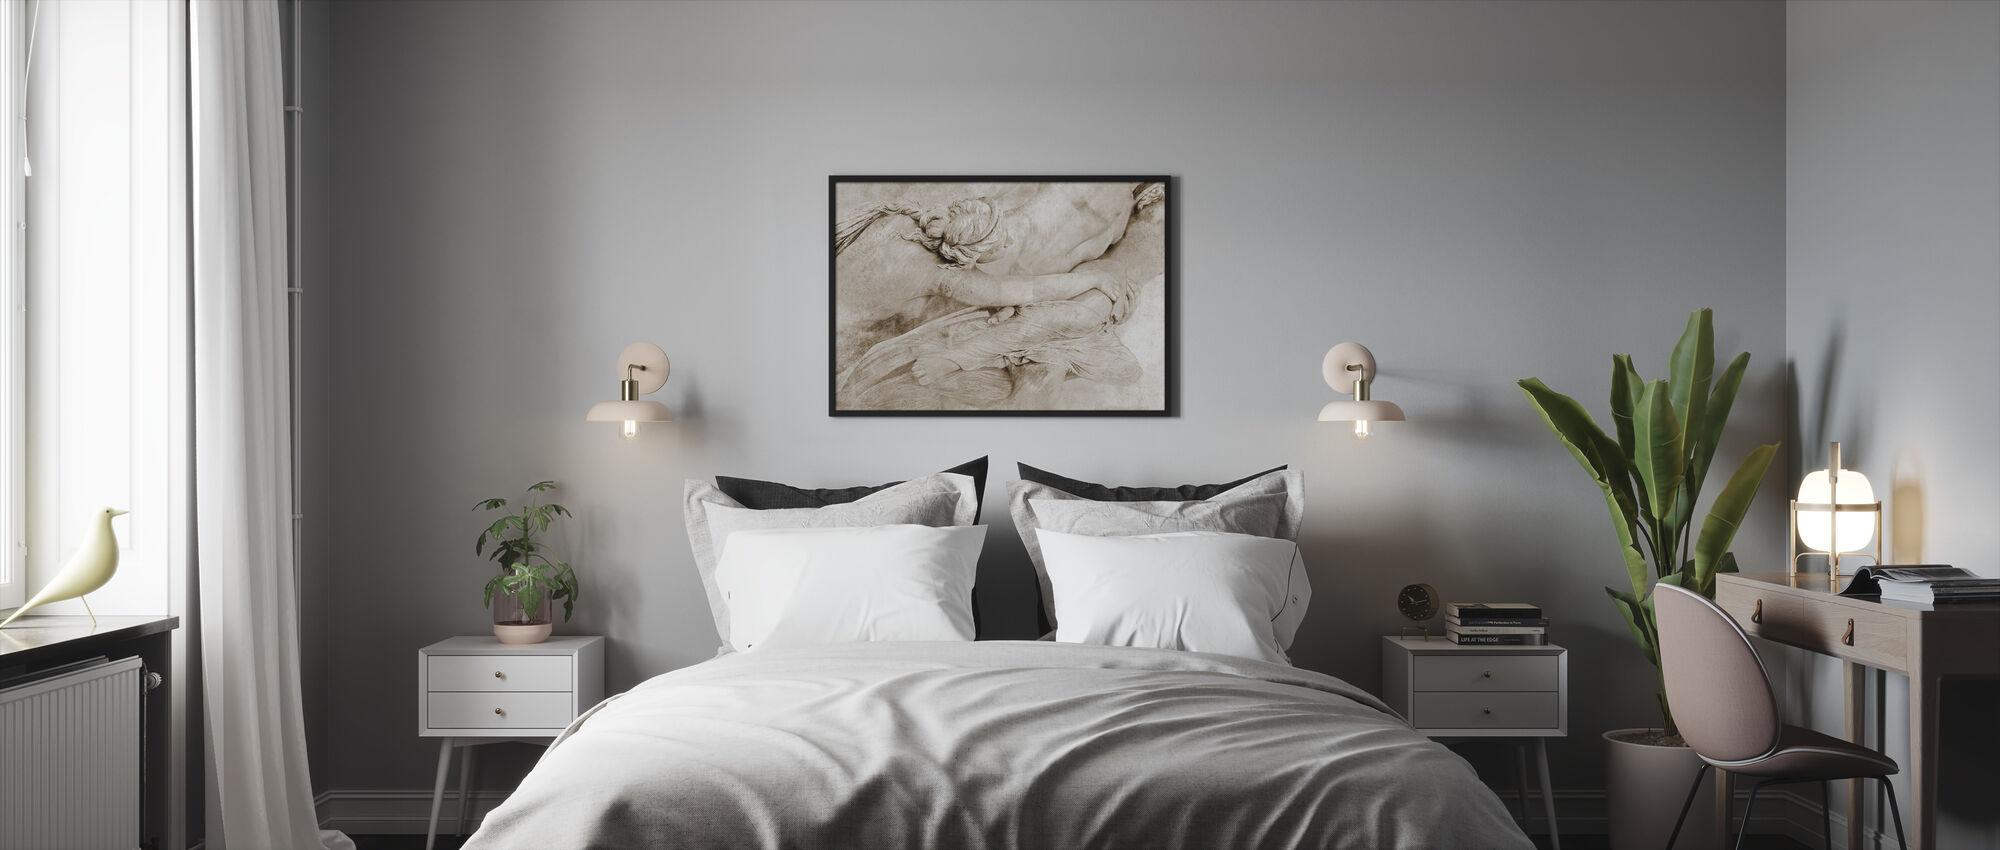 Of the Sculpture - Sepia - Framed print - Bedroom